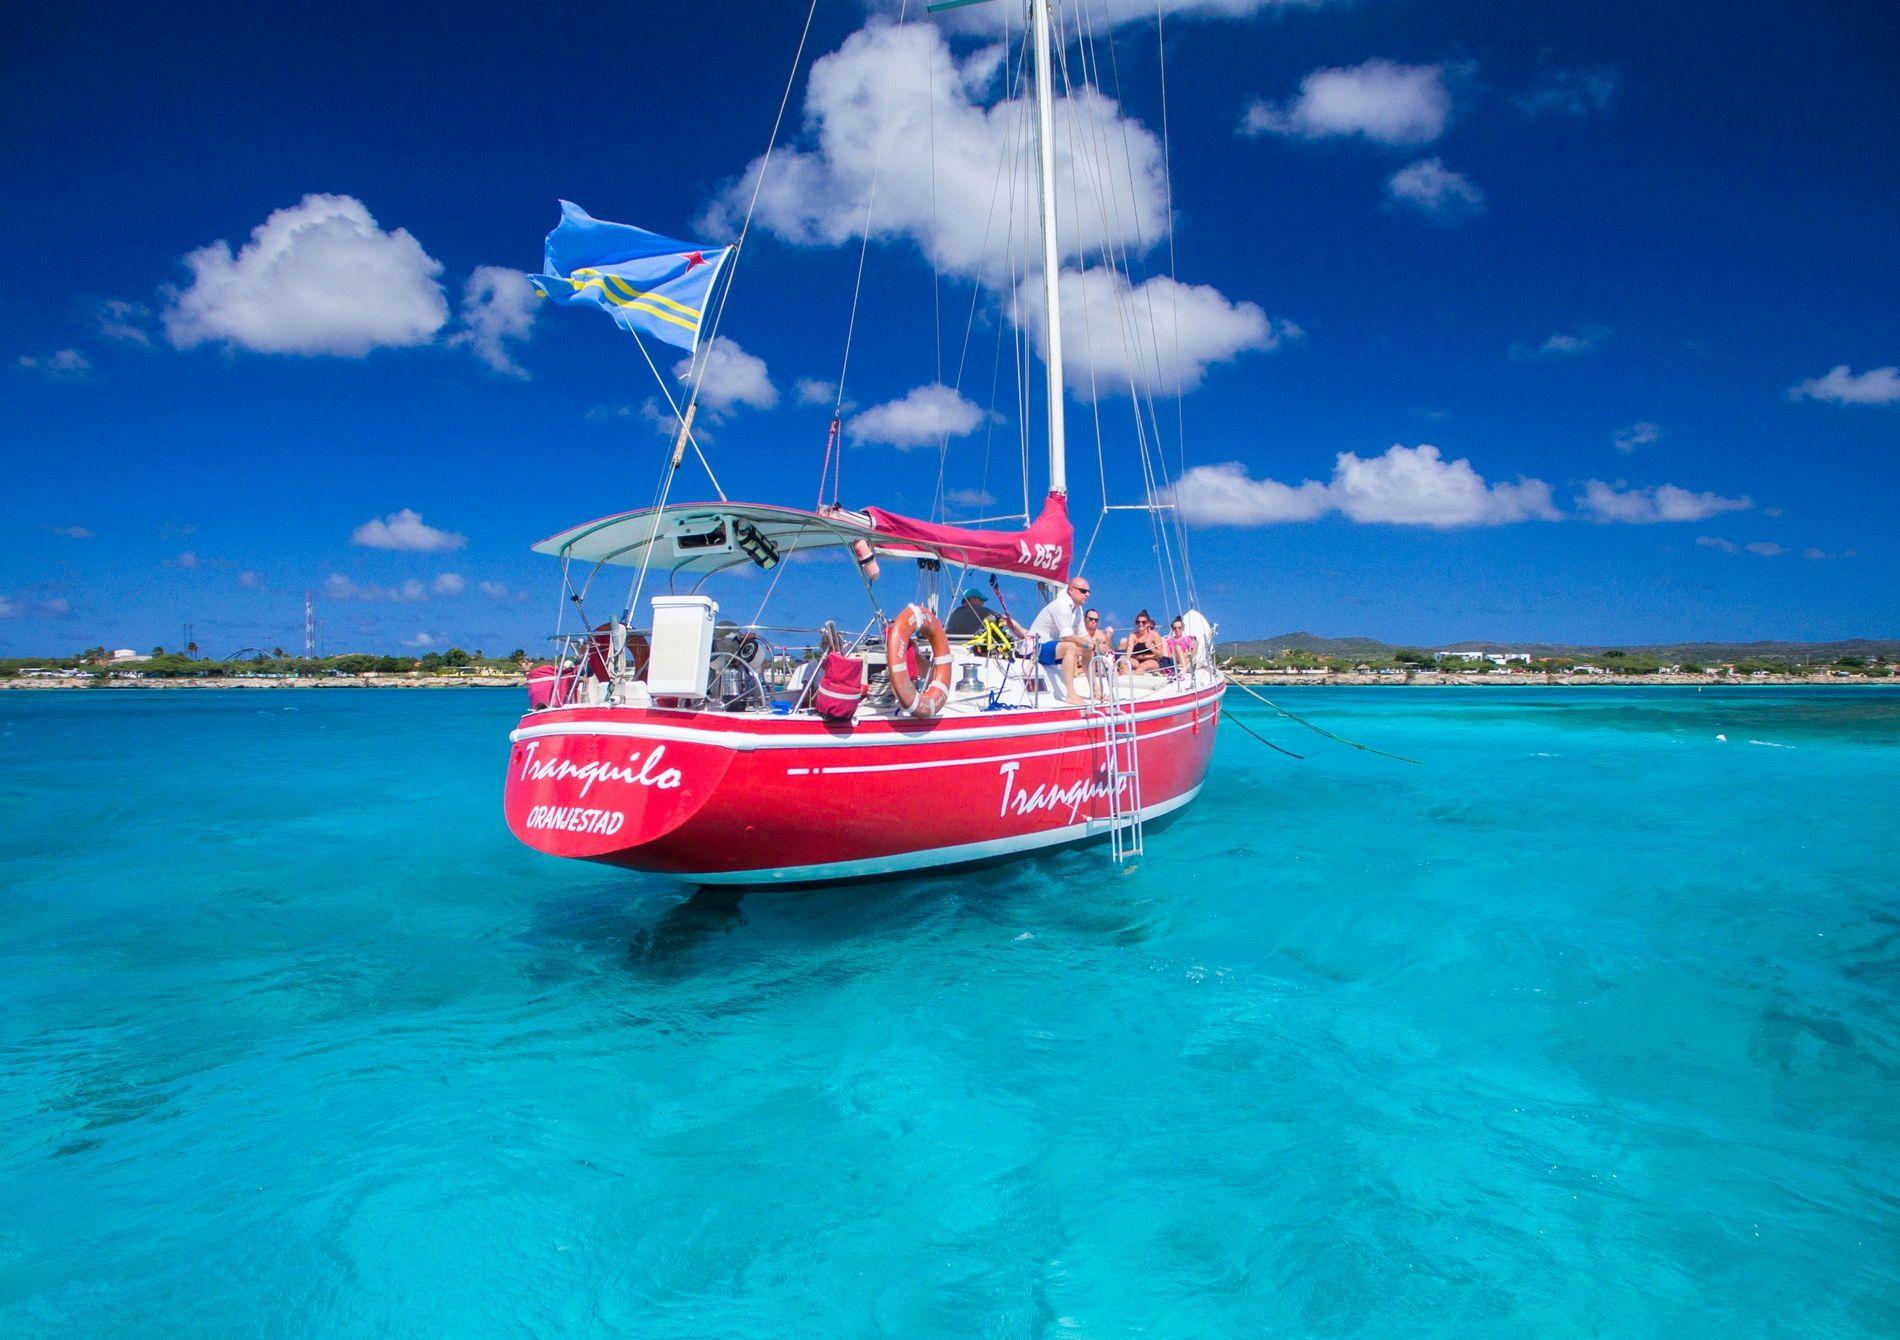 Aruba Sailing Tours And Charters The Tranquilo Aruba Better Snorkeling Spots Vs Black Pearl Visit Aruba Southern Caribbean Aruba